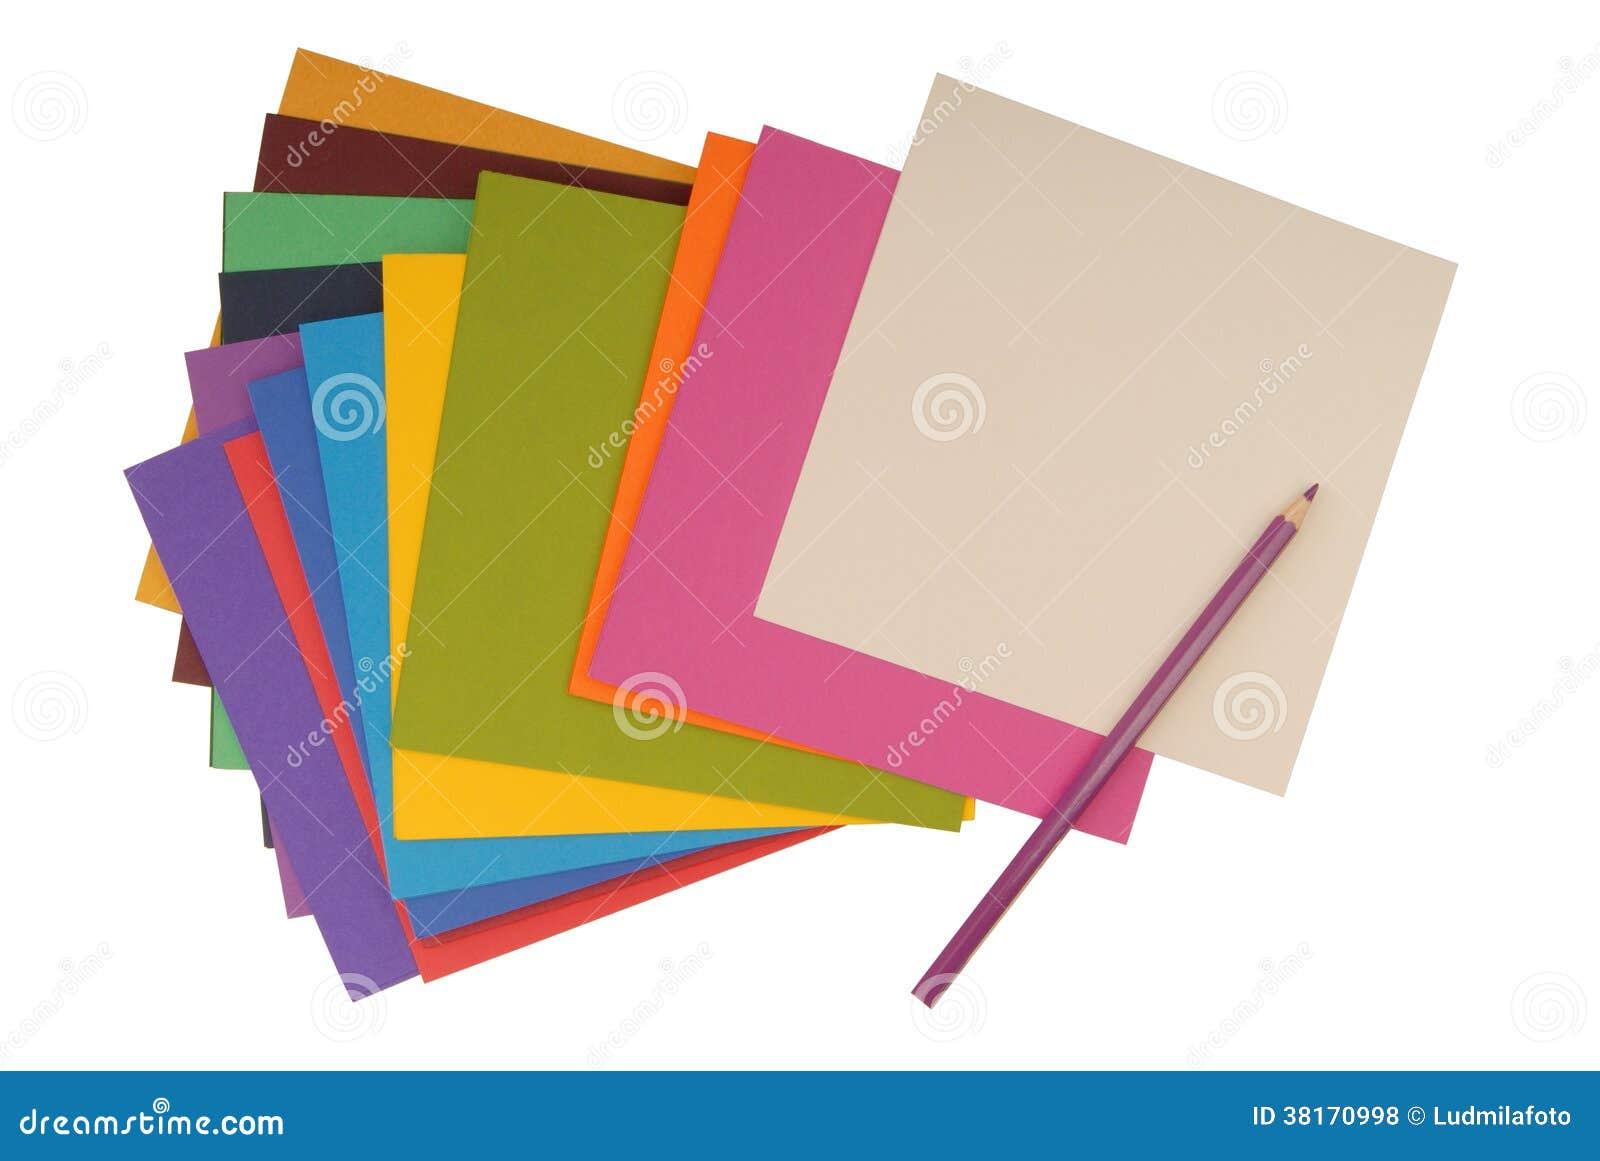 square coloured cardboard